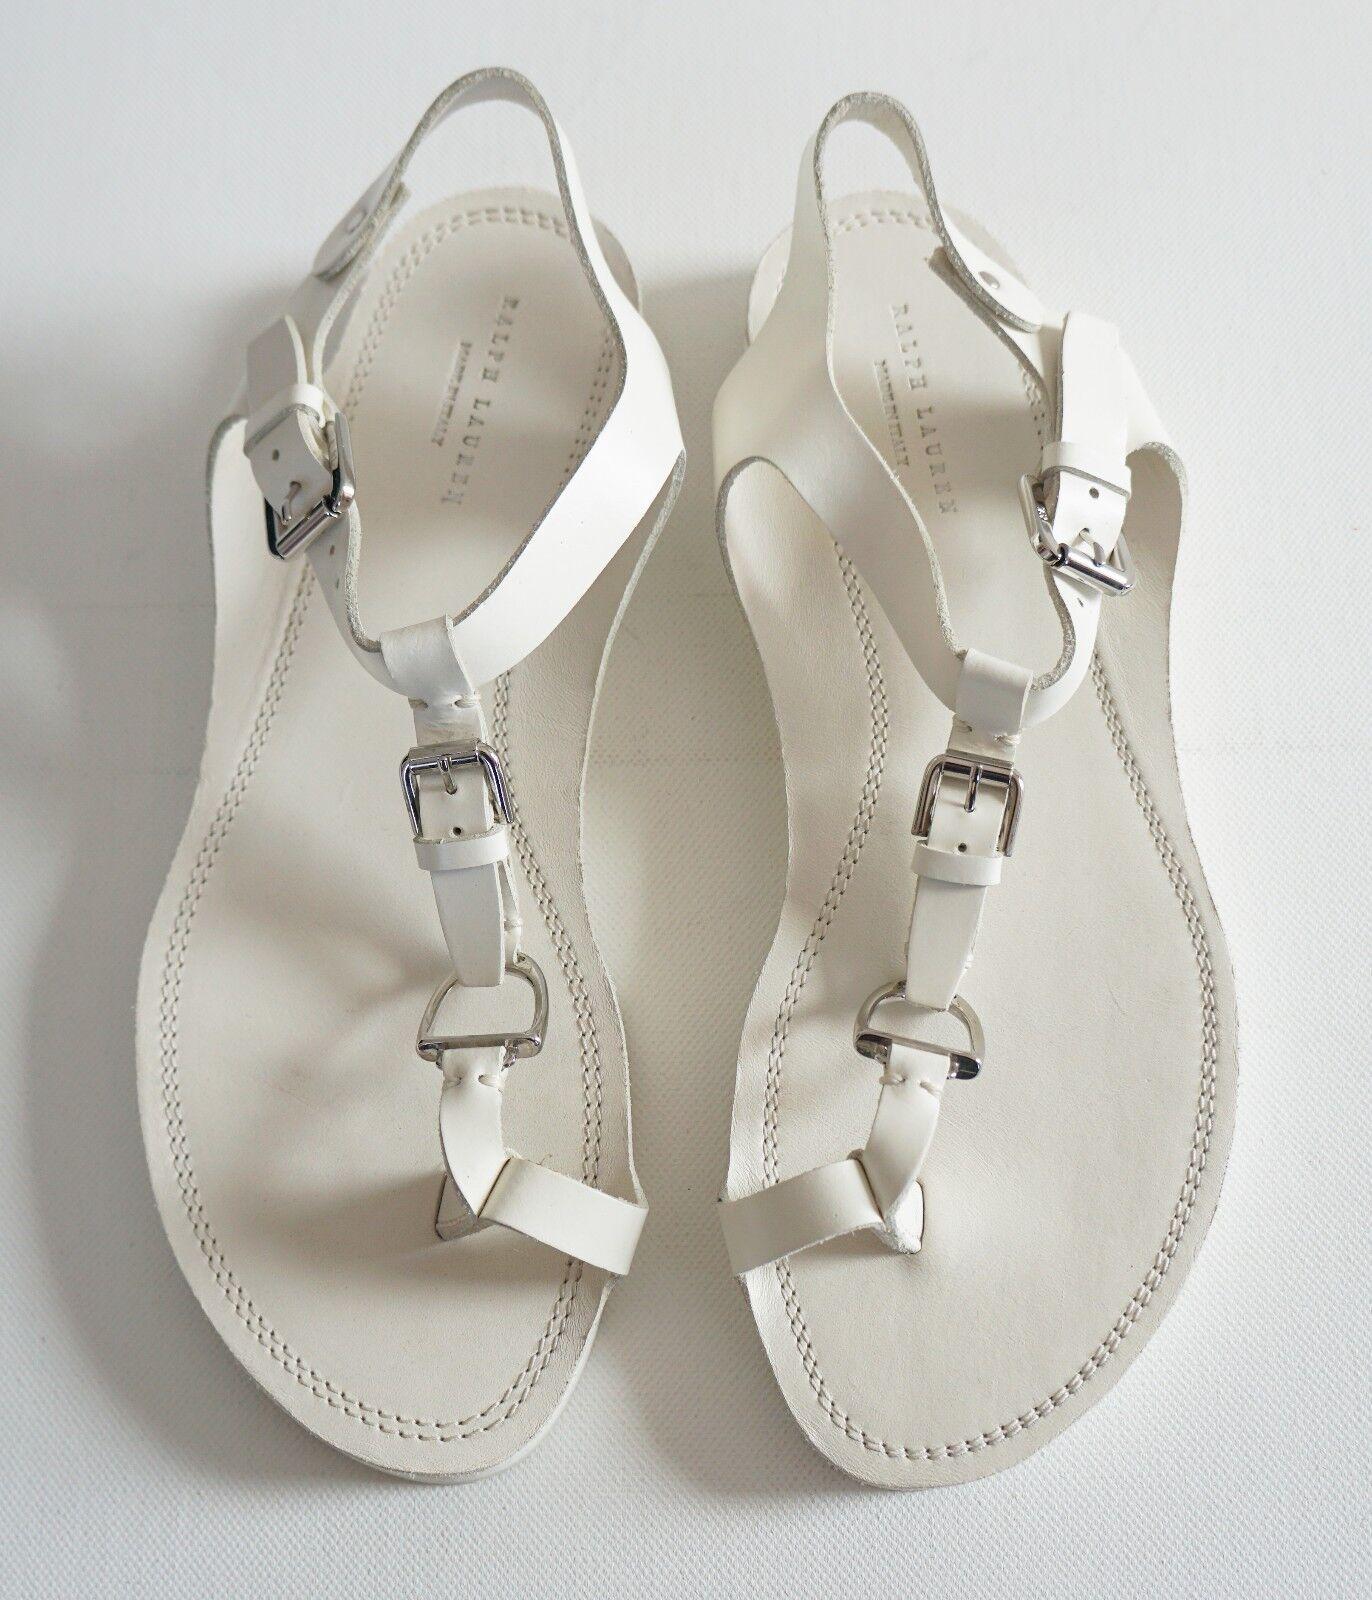 RARPH LAUREN vit vit vit läder STIRRUP Detailing Buckle Flat Sandals Flat Sandals Flats 7B  tidlös klassiker